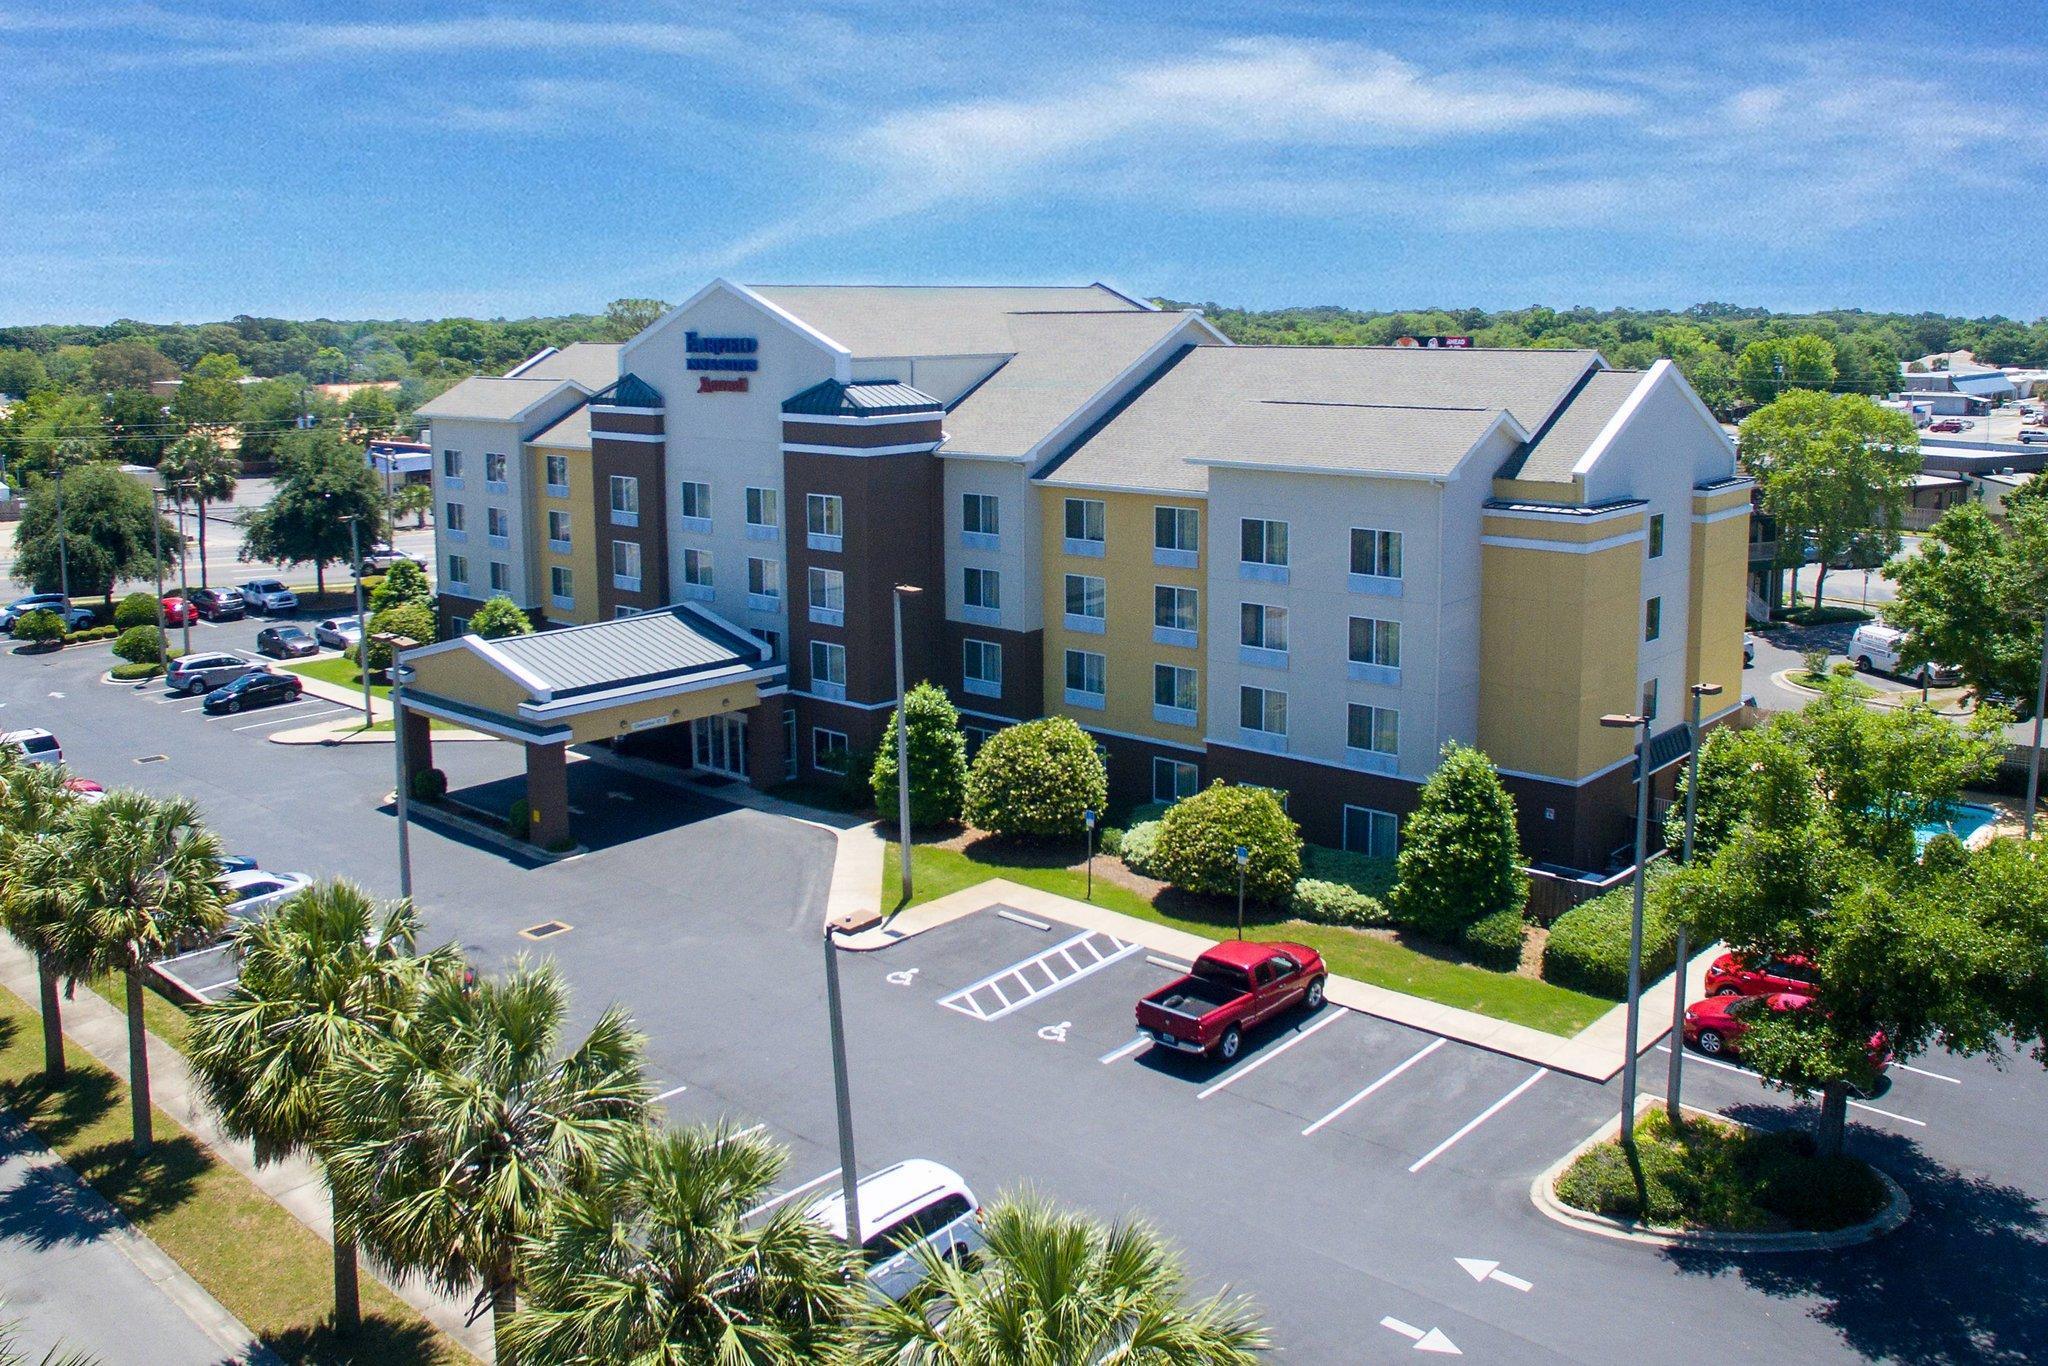 Fairfield Inn And Suites Fort Walton Beach Eglin AFB